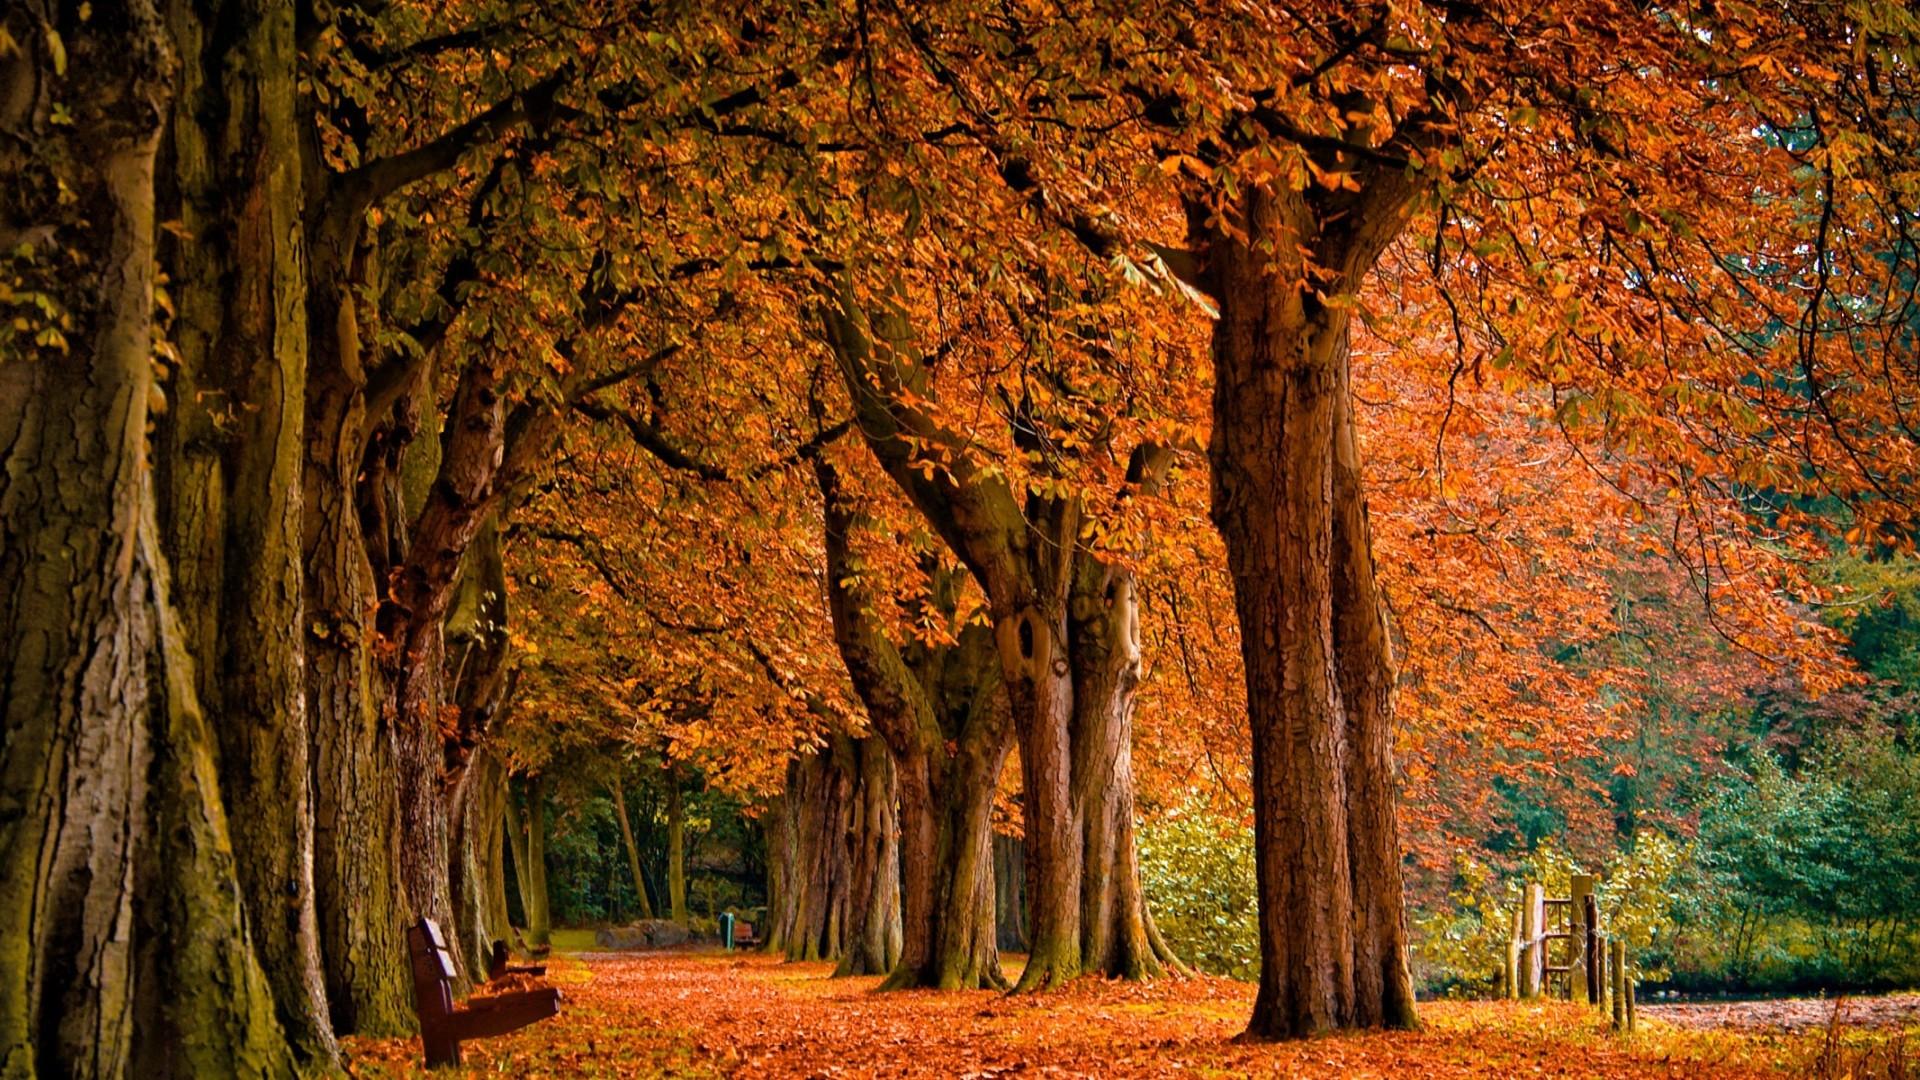 Autumn Background. Autumn Background 1920×1080